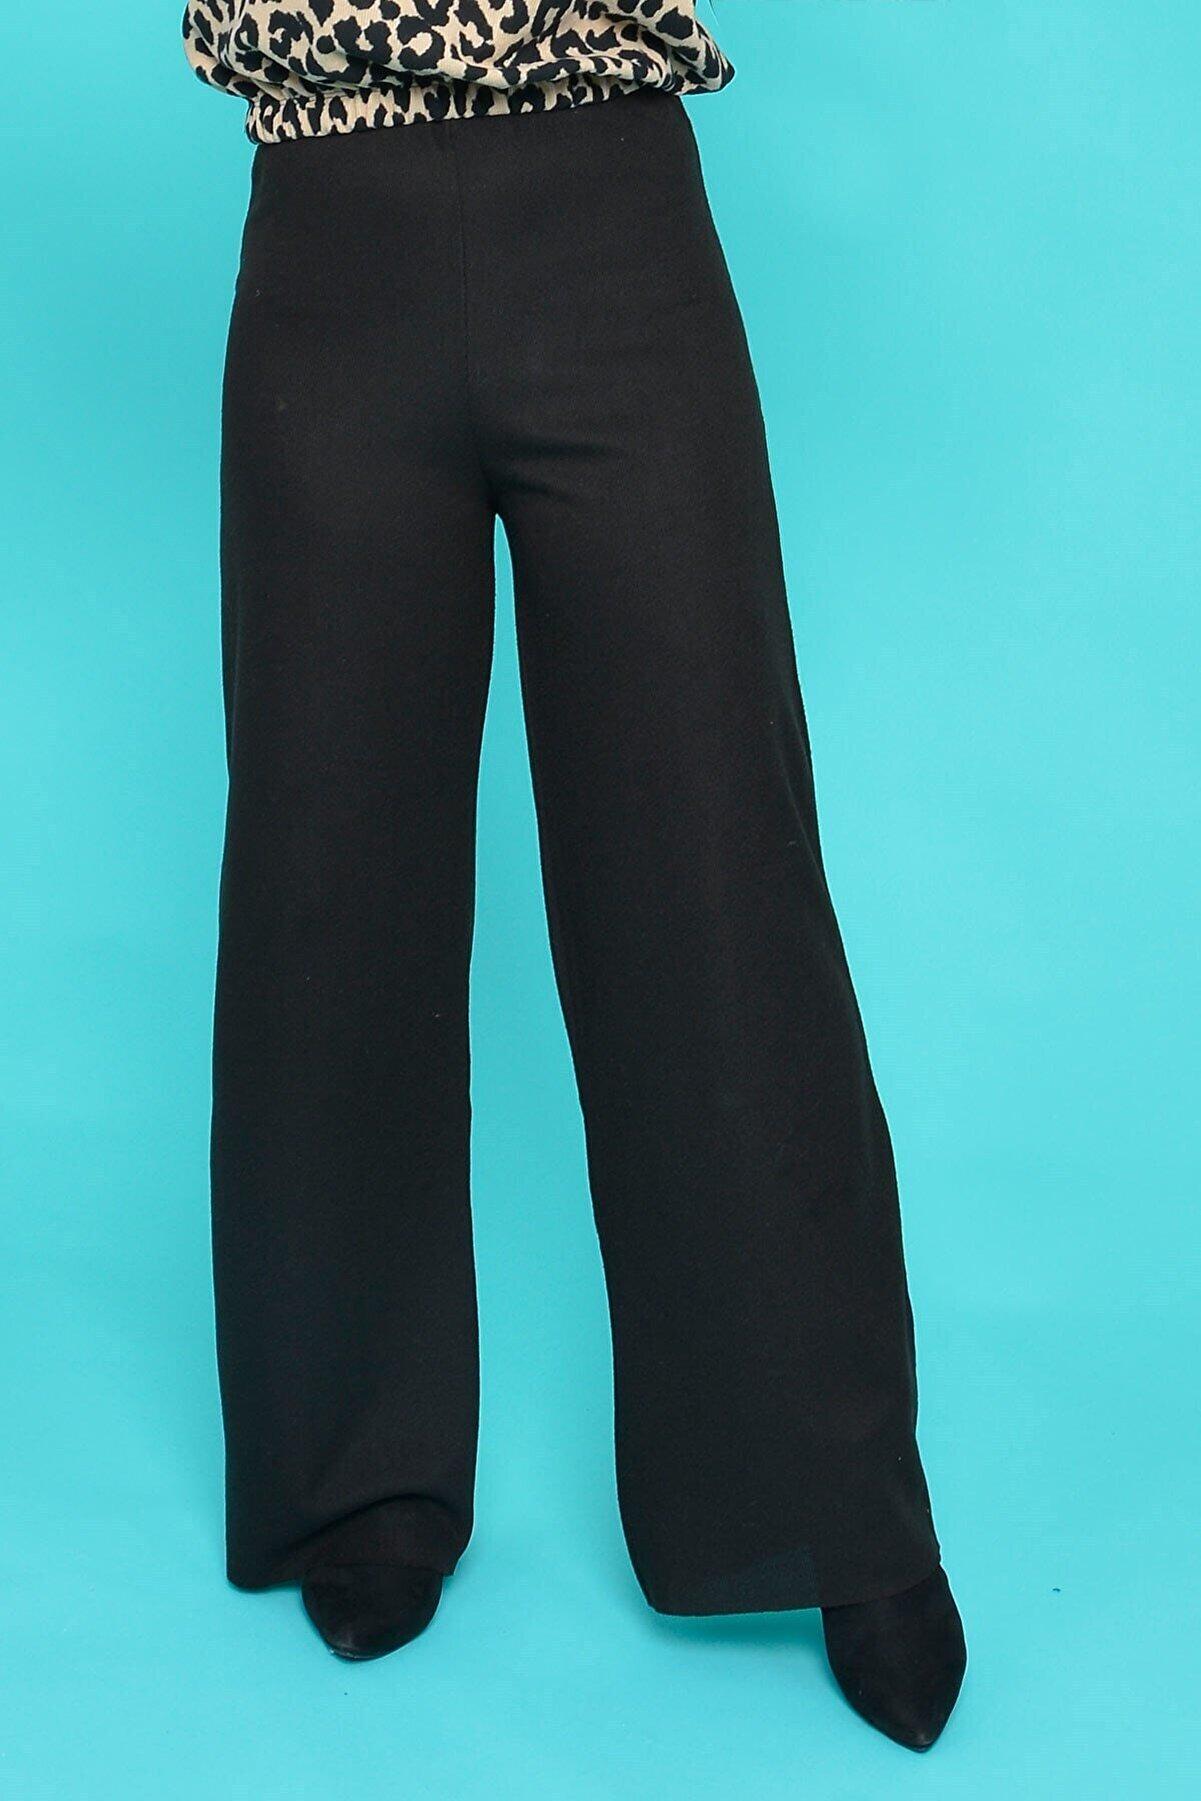 Mossta Kadın Siyah Fitilli Yüksek Bel Pantolon